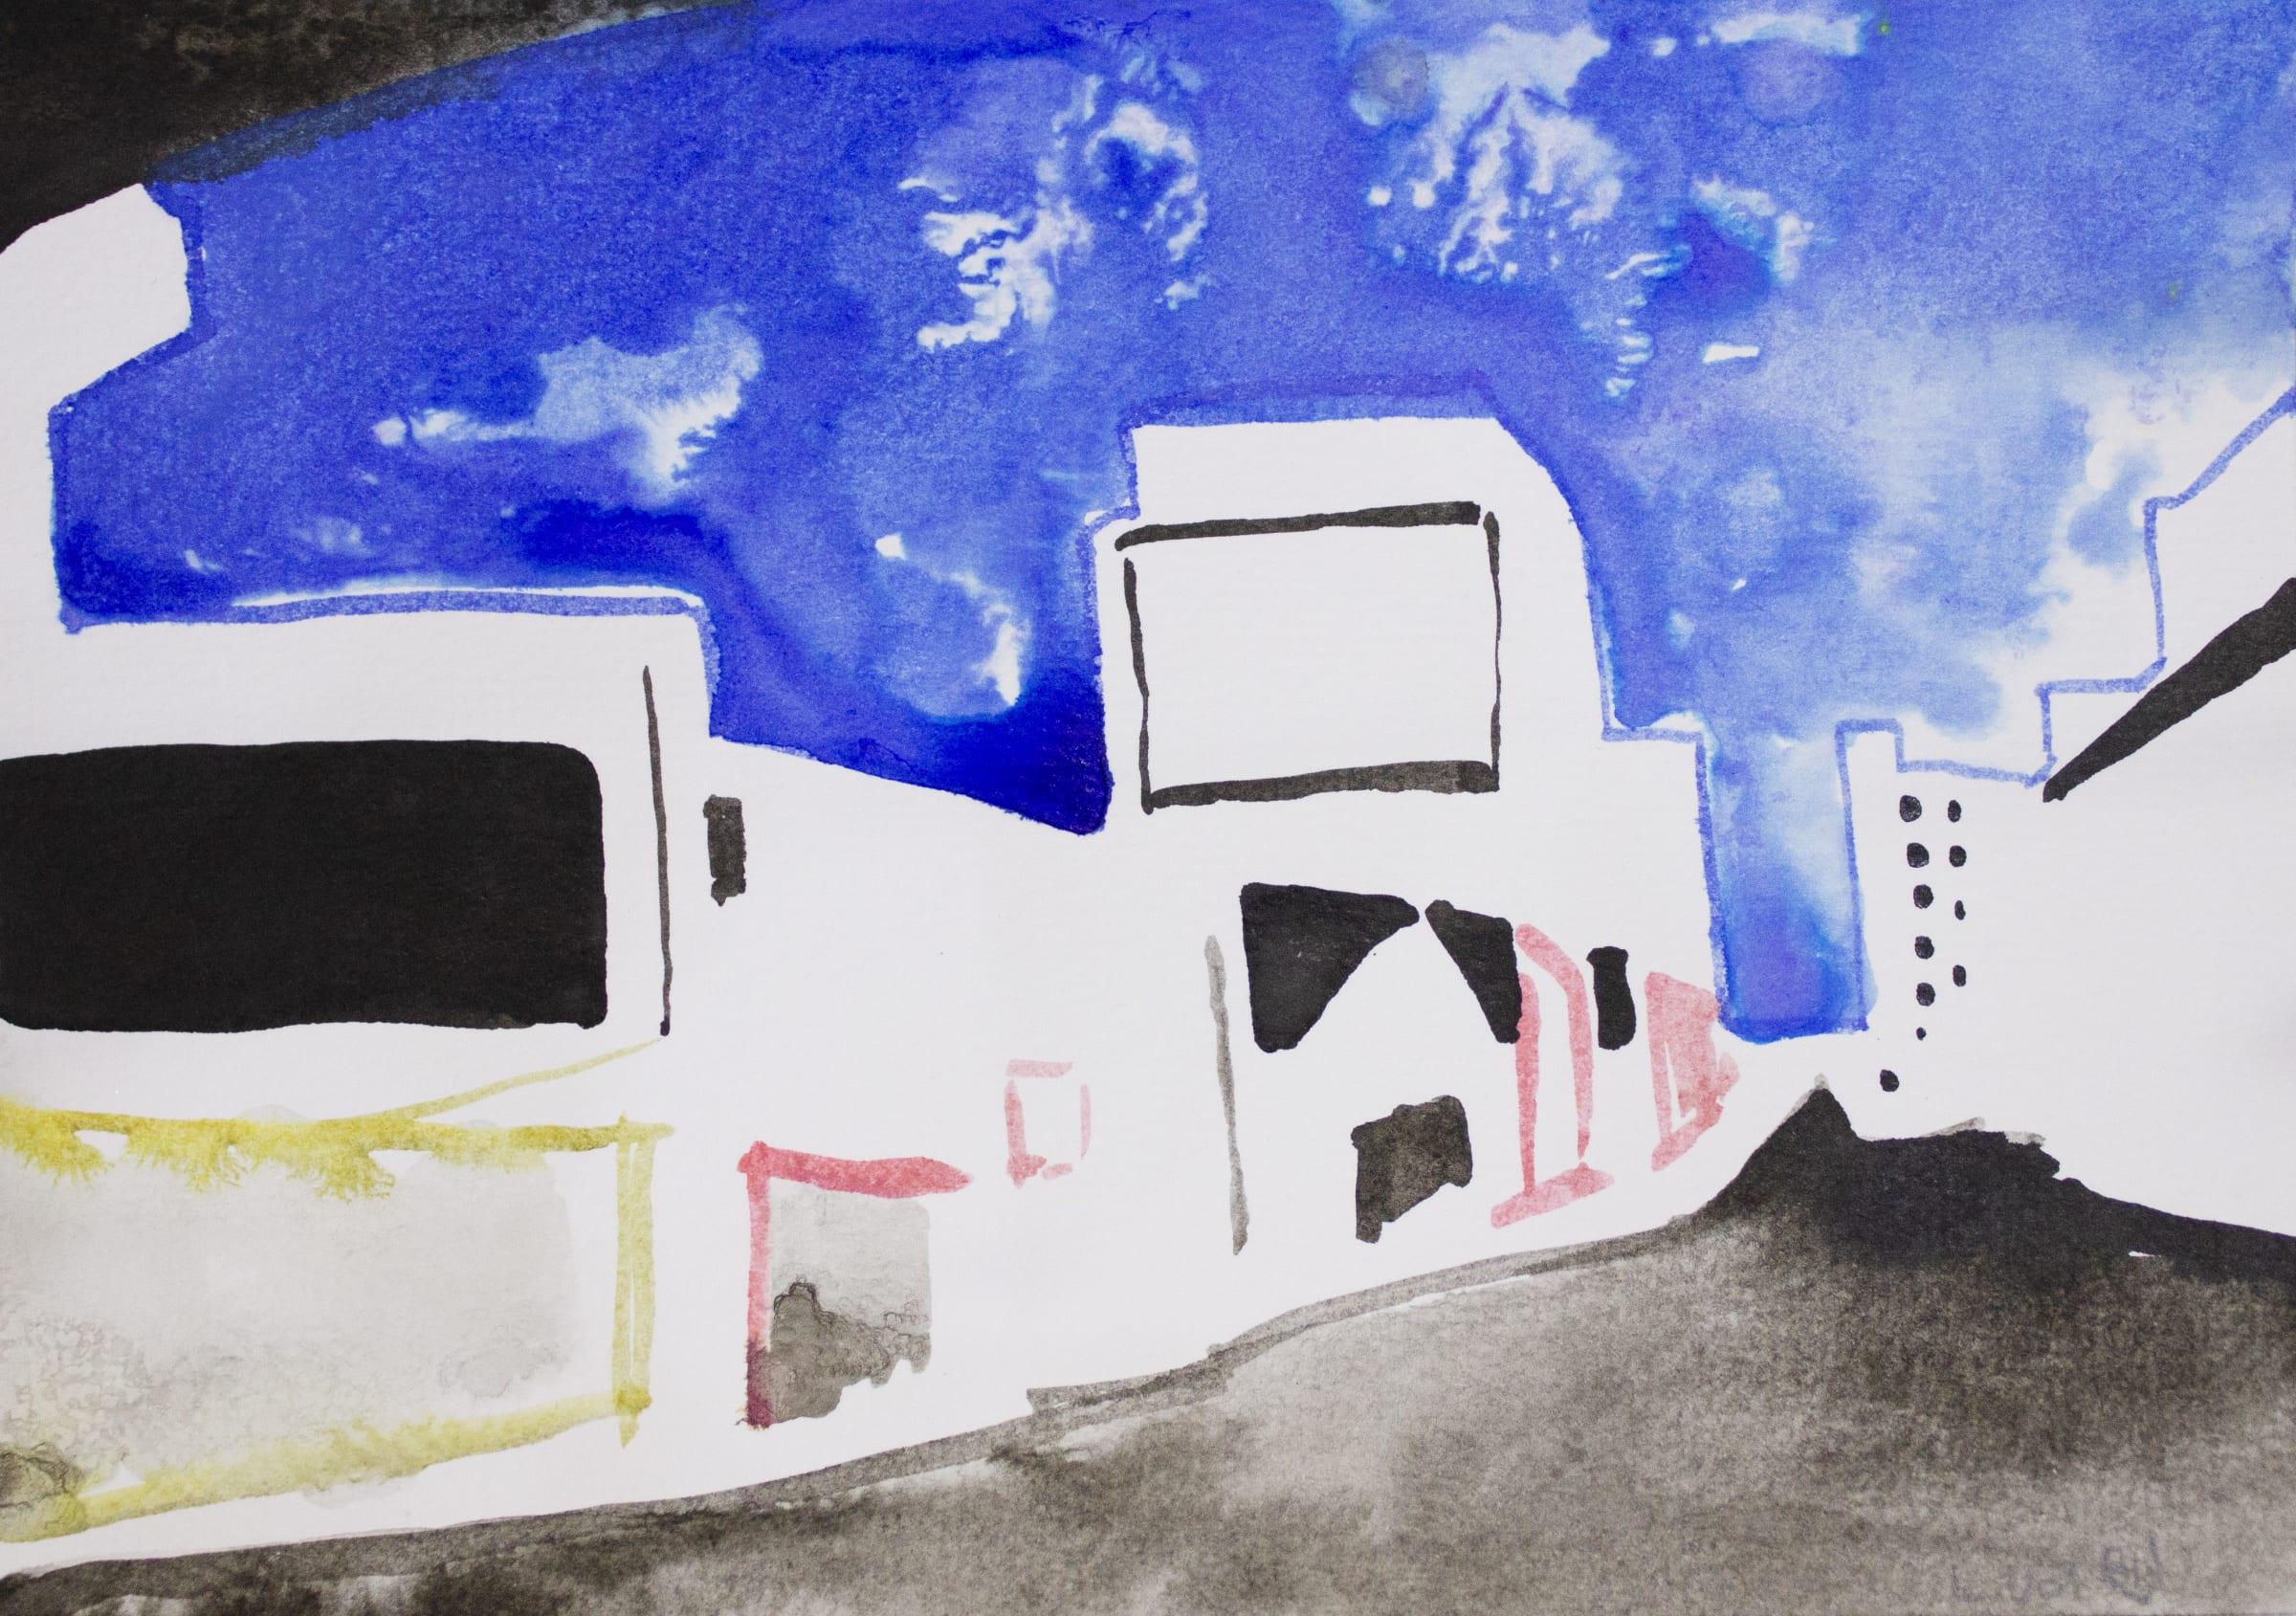 <span class=&#34;link fancybox-details-link&#34;><a href=&#34;/artists/88-louise-van-der-bijl/works/2294-louise-van-der-bijl-inktober-day-30-2018/&#34;>View Detail Page</a></span><div class=&#34;artist&#34;><strong>Louise Van Der Bijl</strong></div> <div class=&#34;title&#34;><em>Inktober Day 30</em>, 2018</div> <div class=&#34;medium&#34;>Ink On Paper</div> <div class=&#34;dimensions&#34;>14.8cm x 21.1cm</div><div class=&#34;price&#34;>R400.00</div>